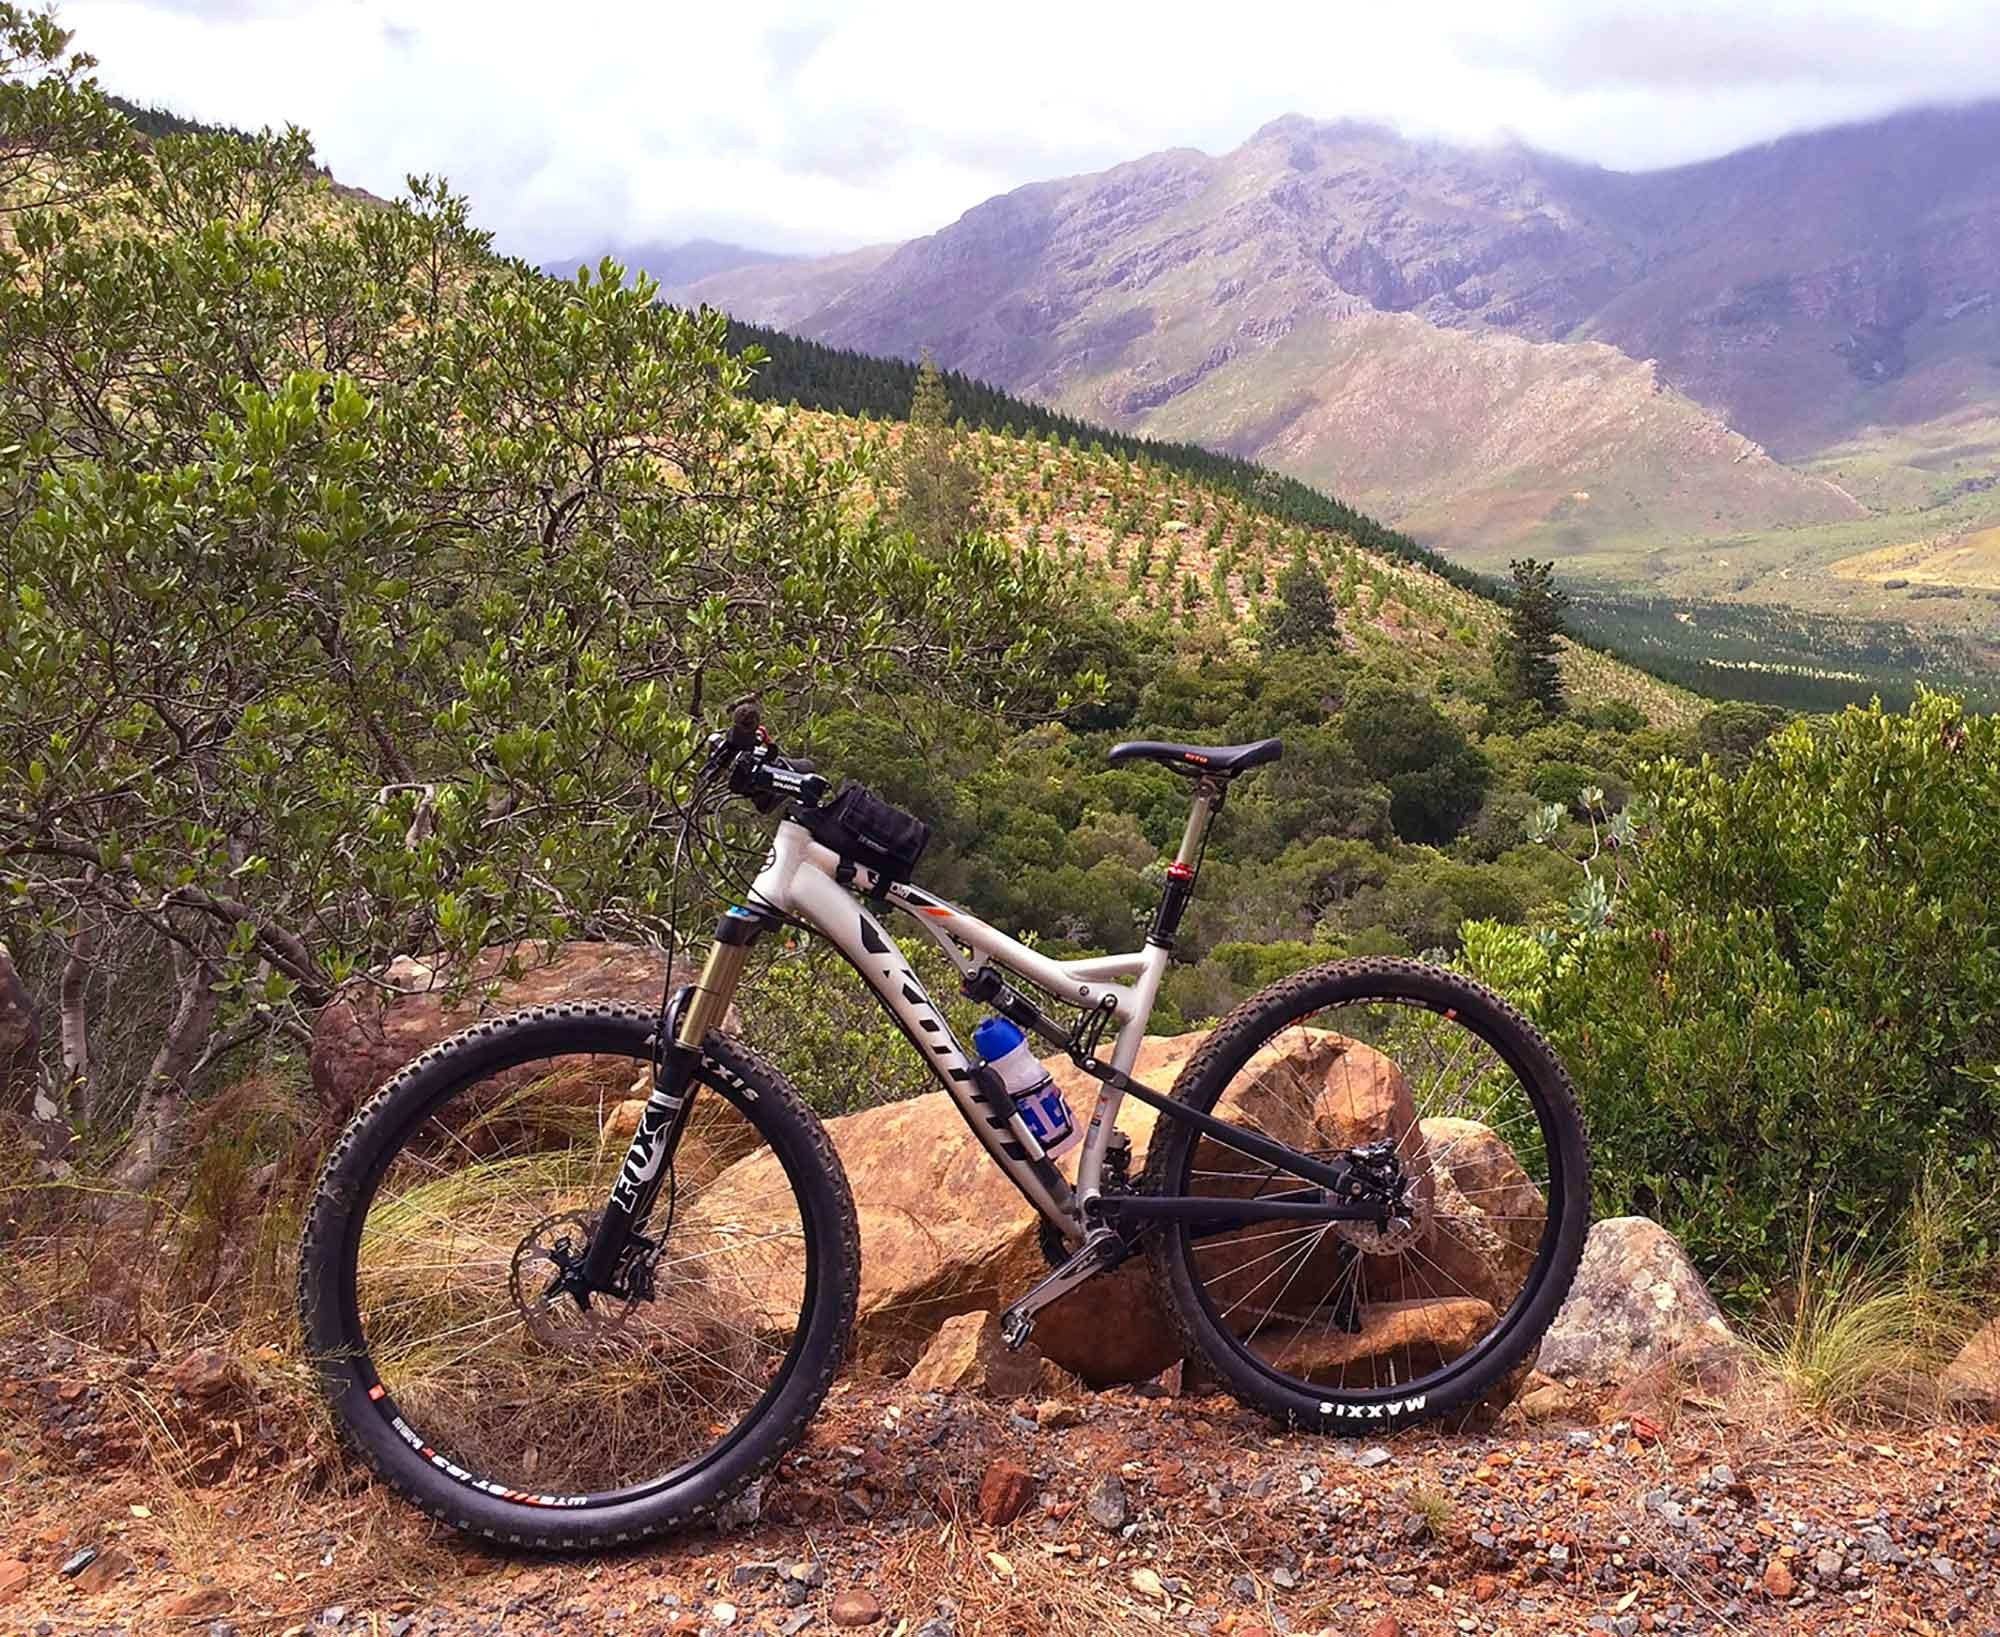 Test Riding the Kona Satori in South Africa